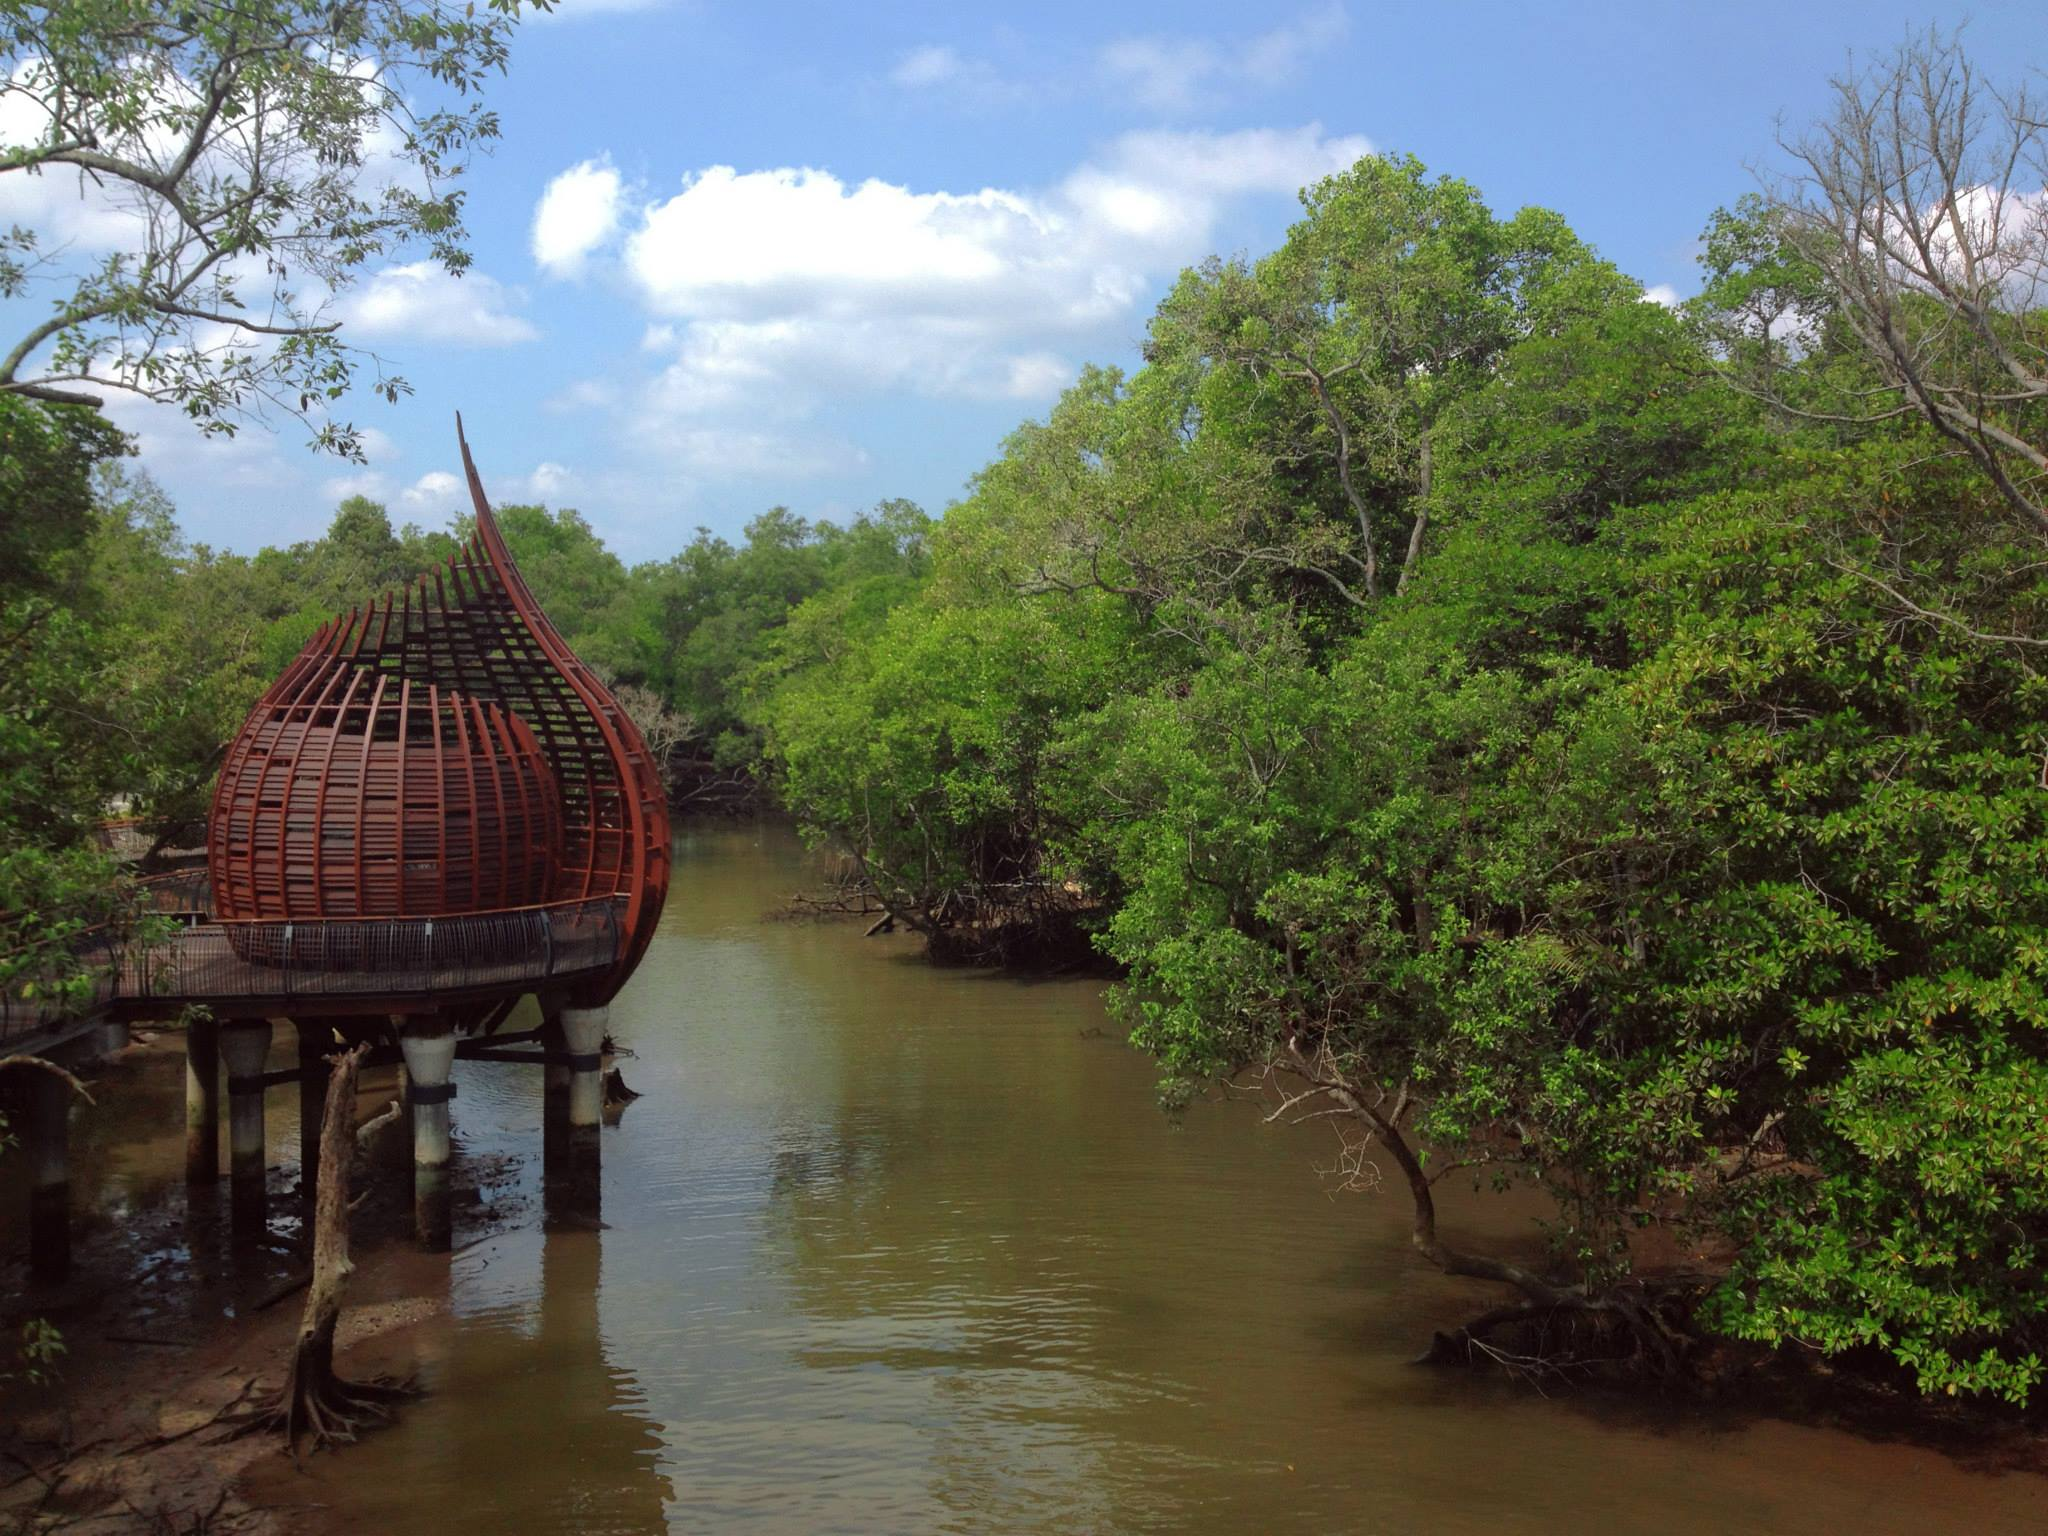 Deep inside the mangroves © Andrew Darwitan